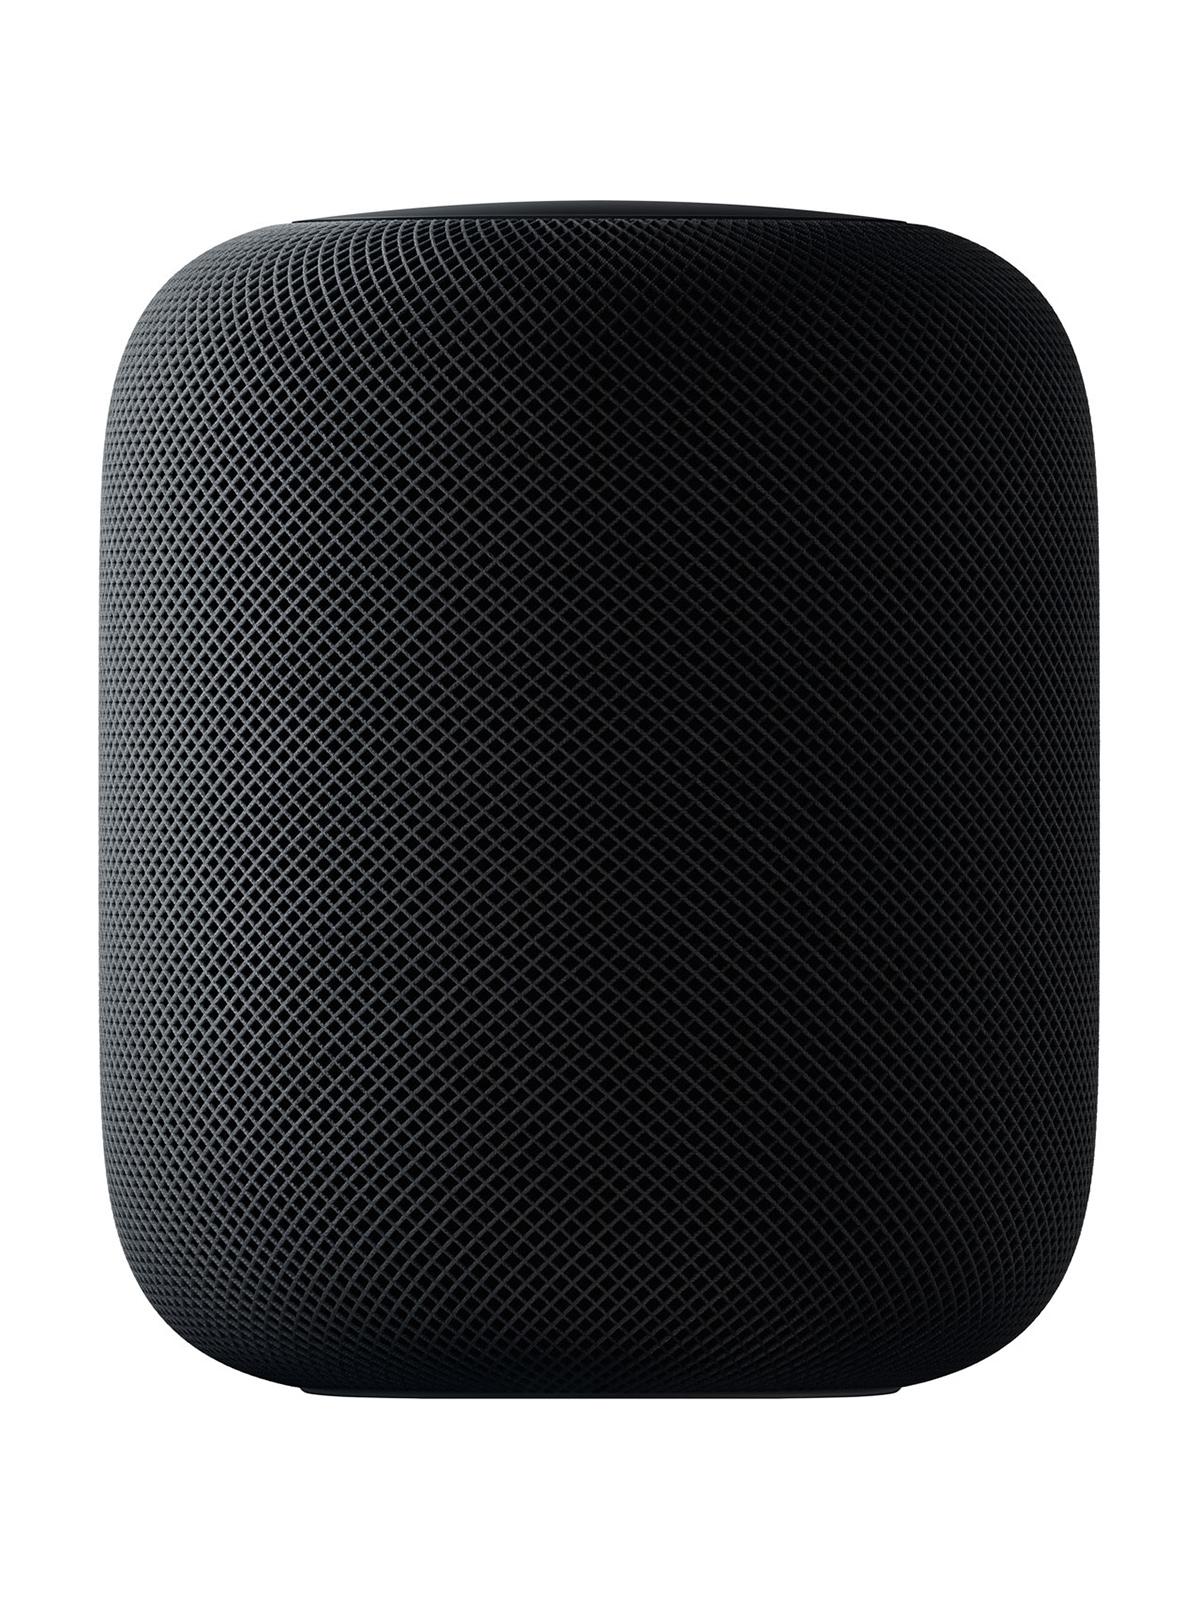 Apple HomePod with Siri – Space Grey (MQHW2B/A) at elekdirect - £210